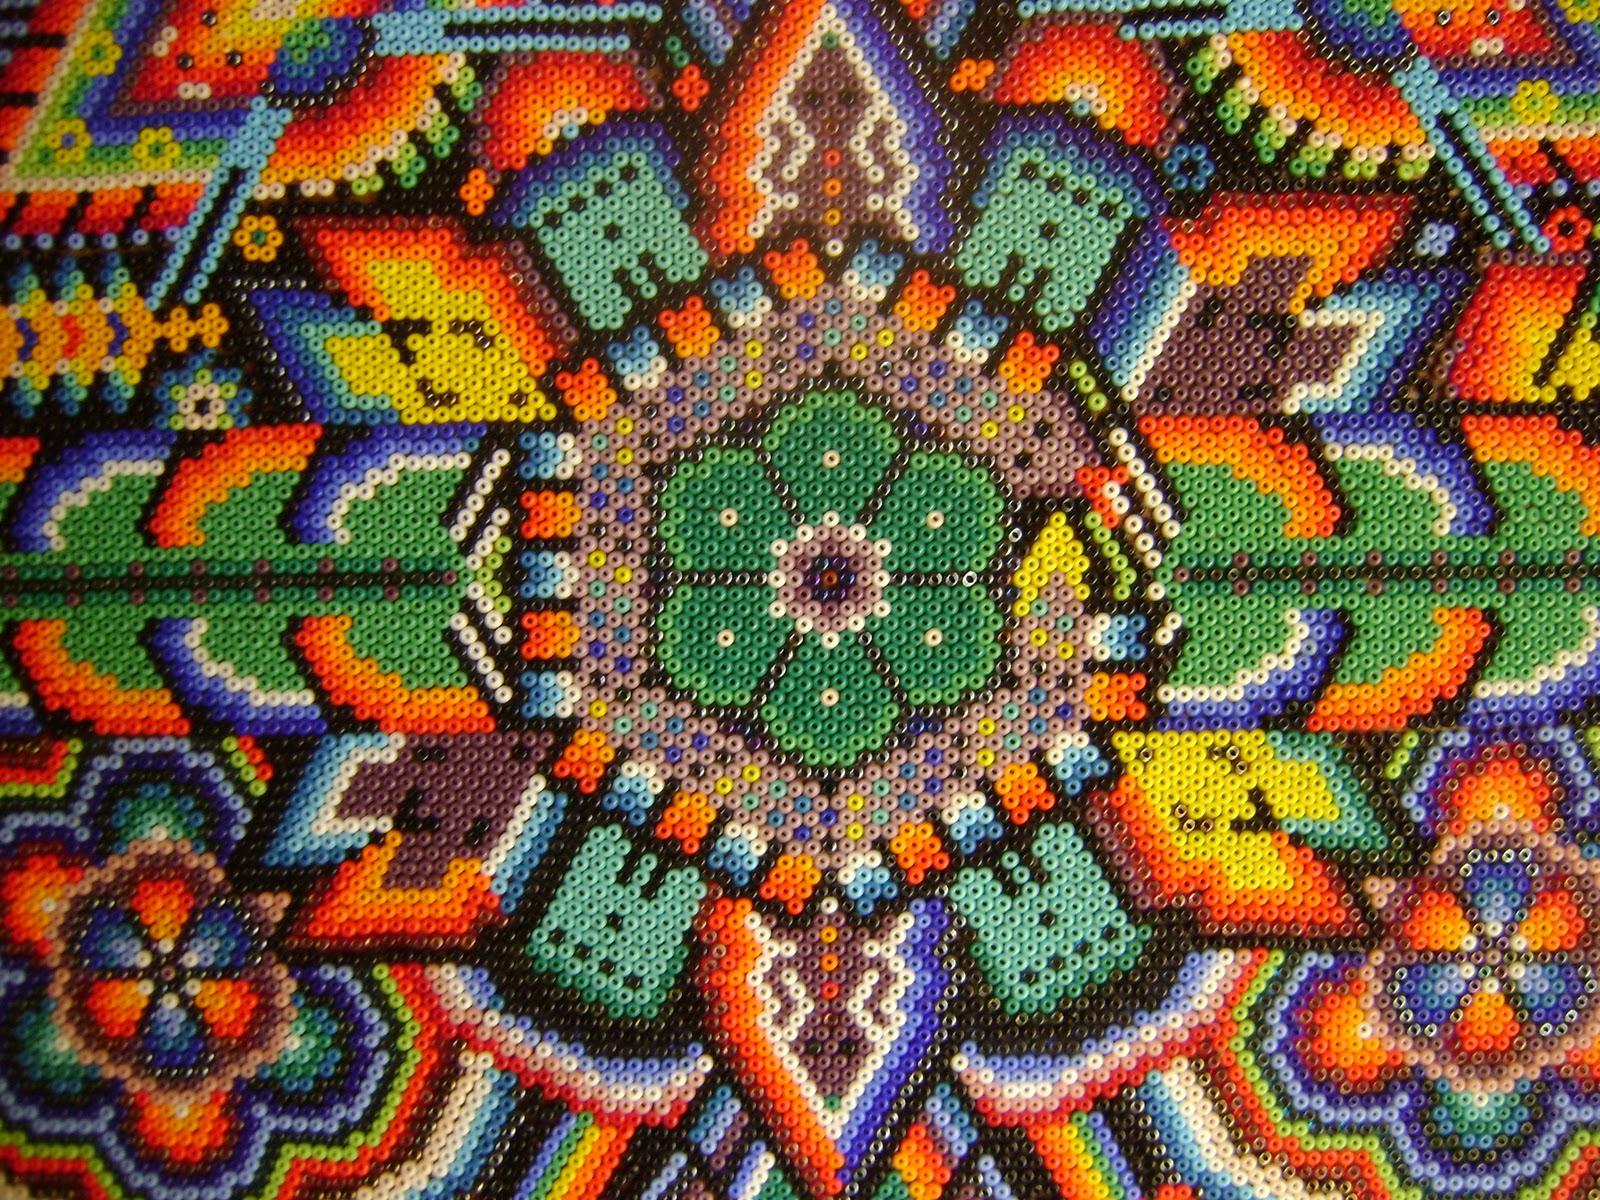 huichol beaded art peyote flower   Xica Nation 1600x1200